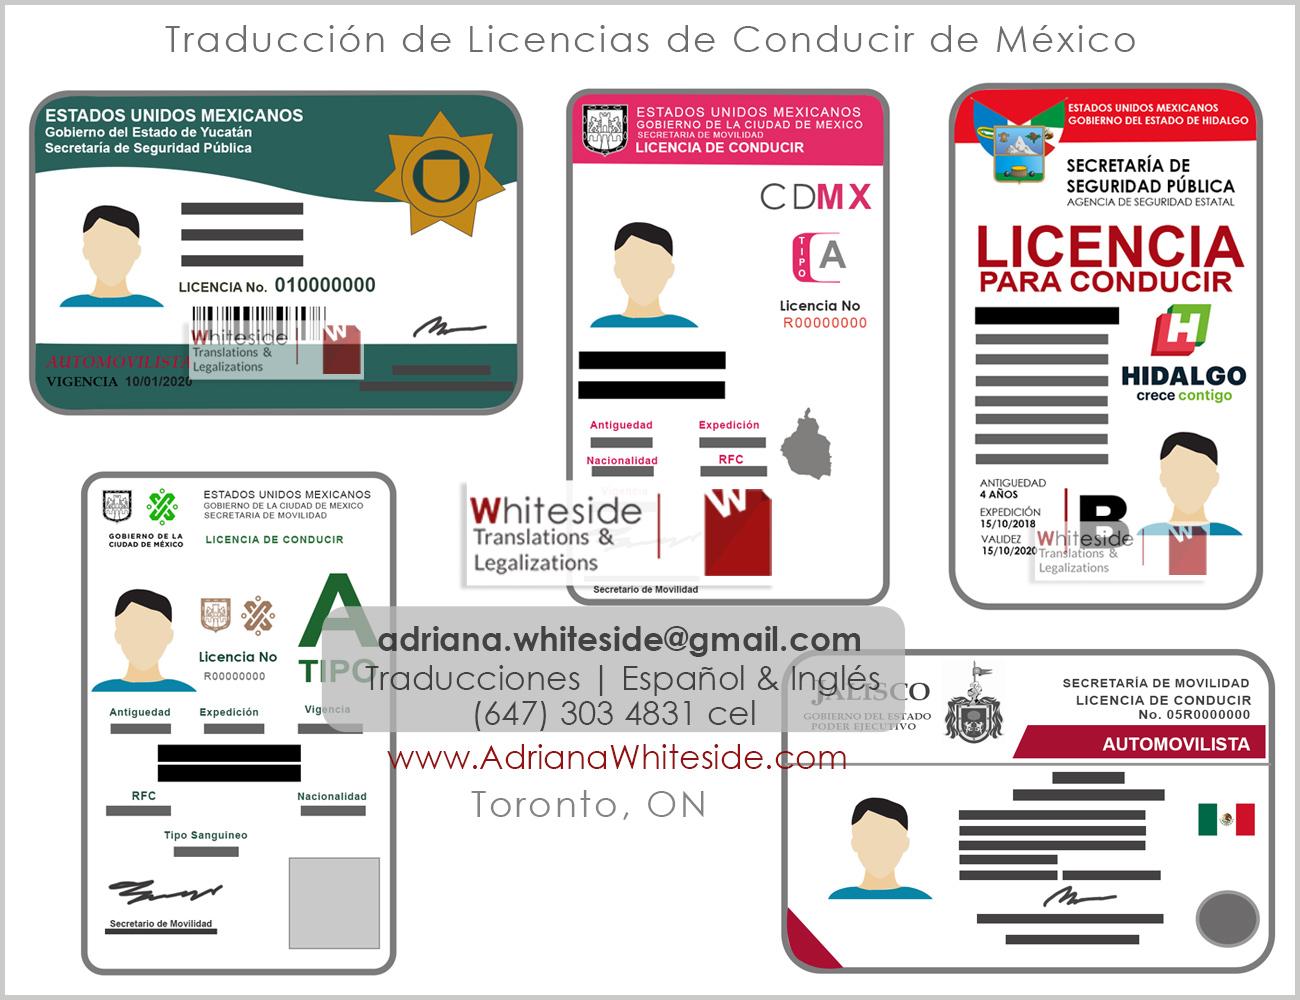 Traducción de Licencia de Conducir de México